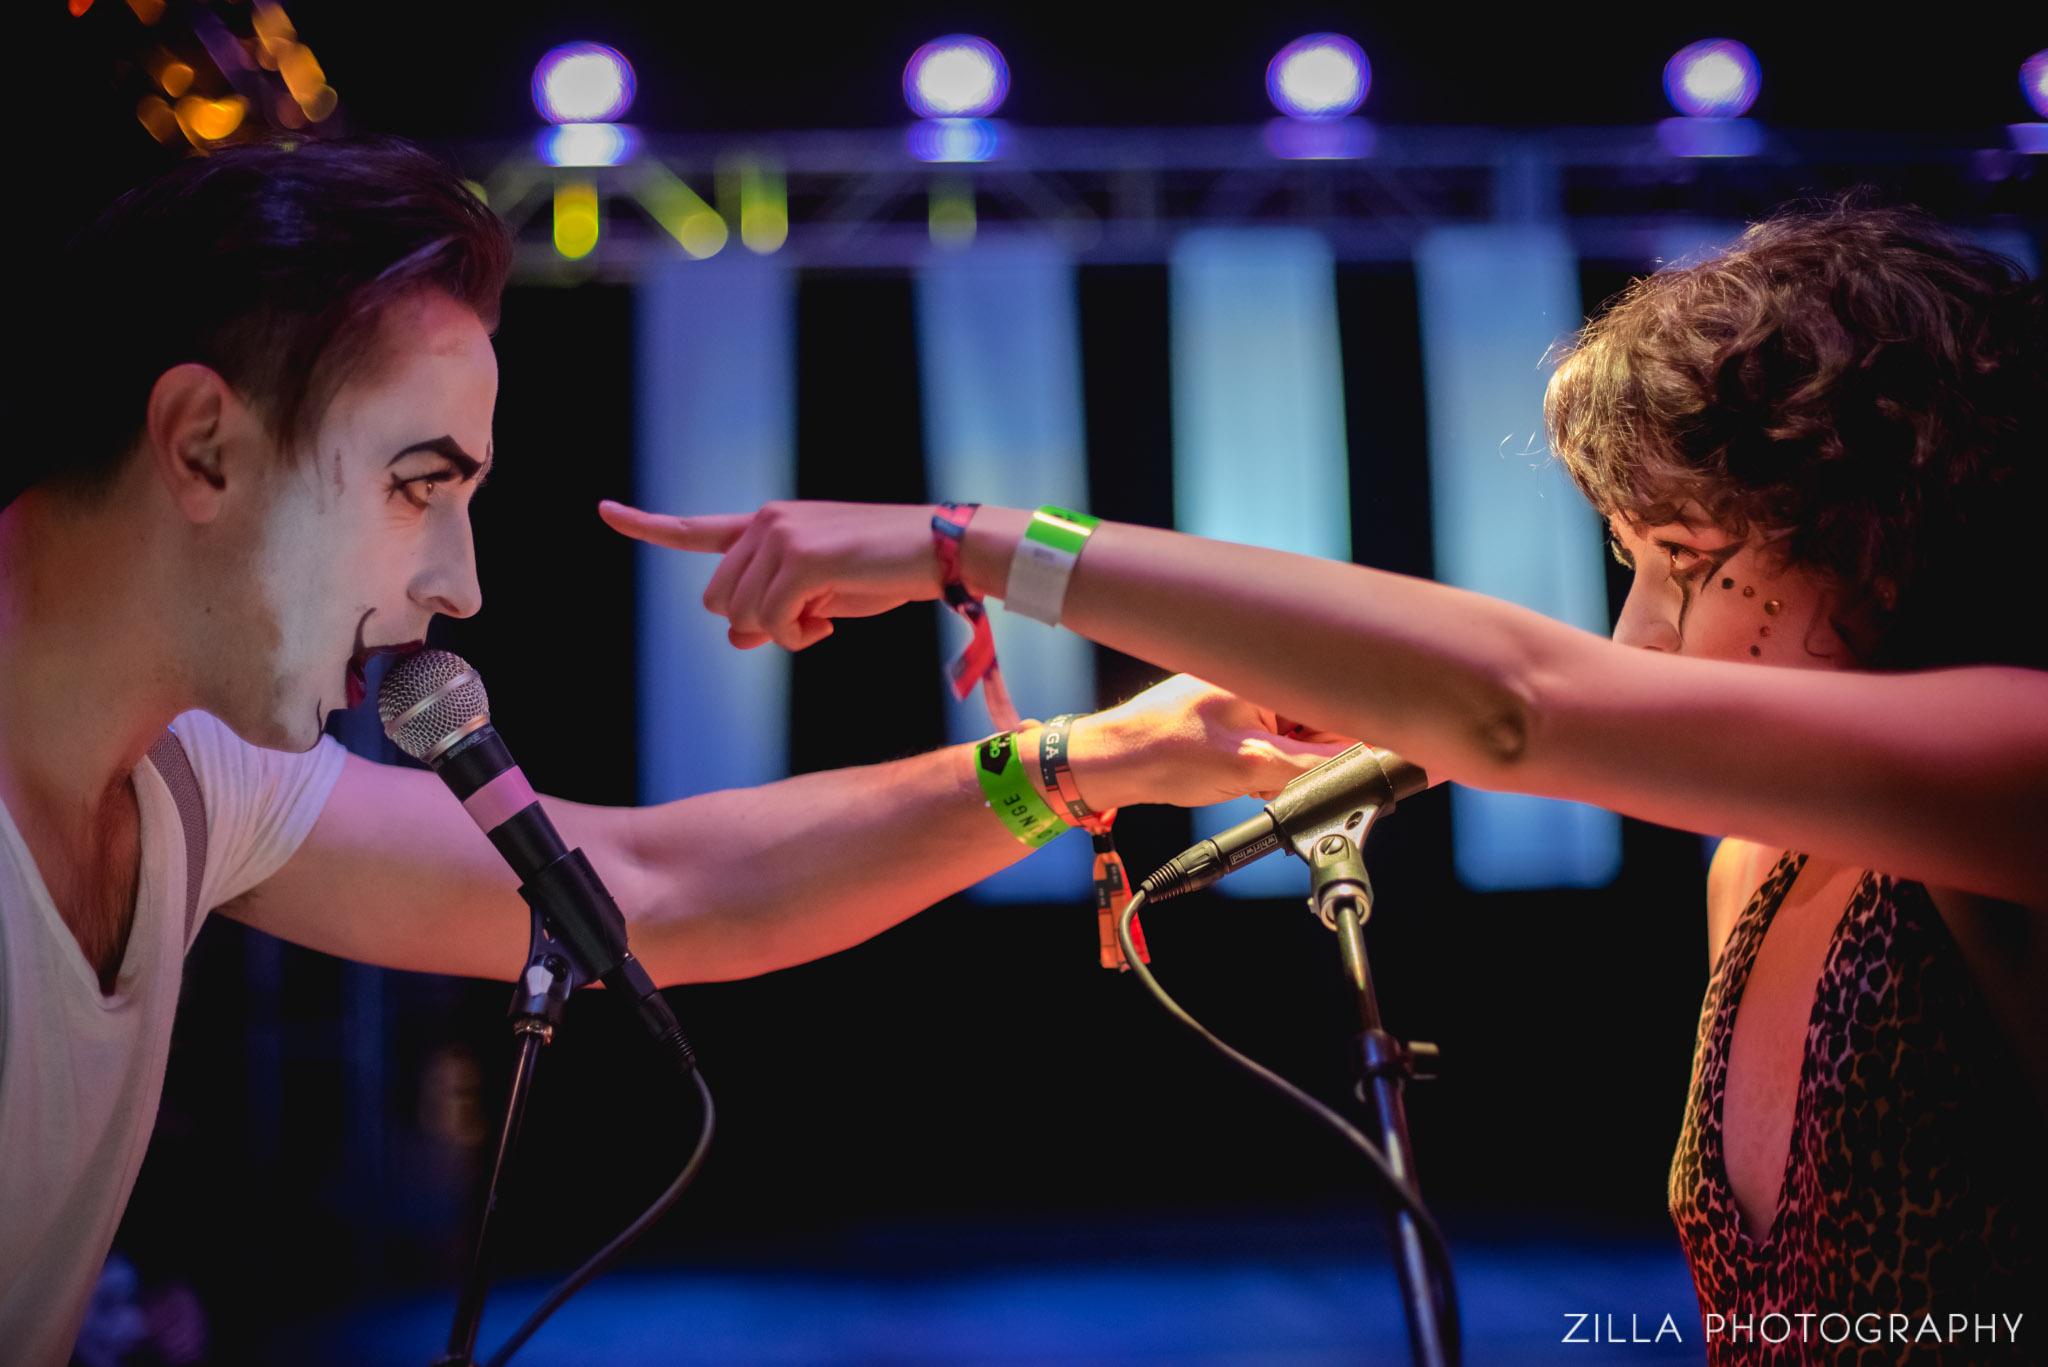 Zilla Photography-Treefort Music Fest 2016 Day 2-45.jpg